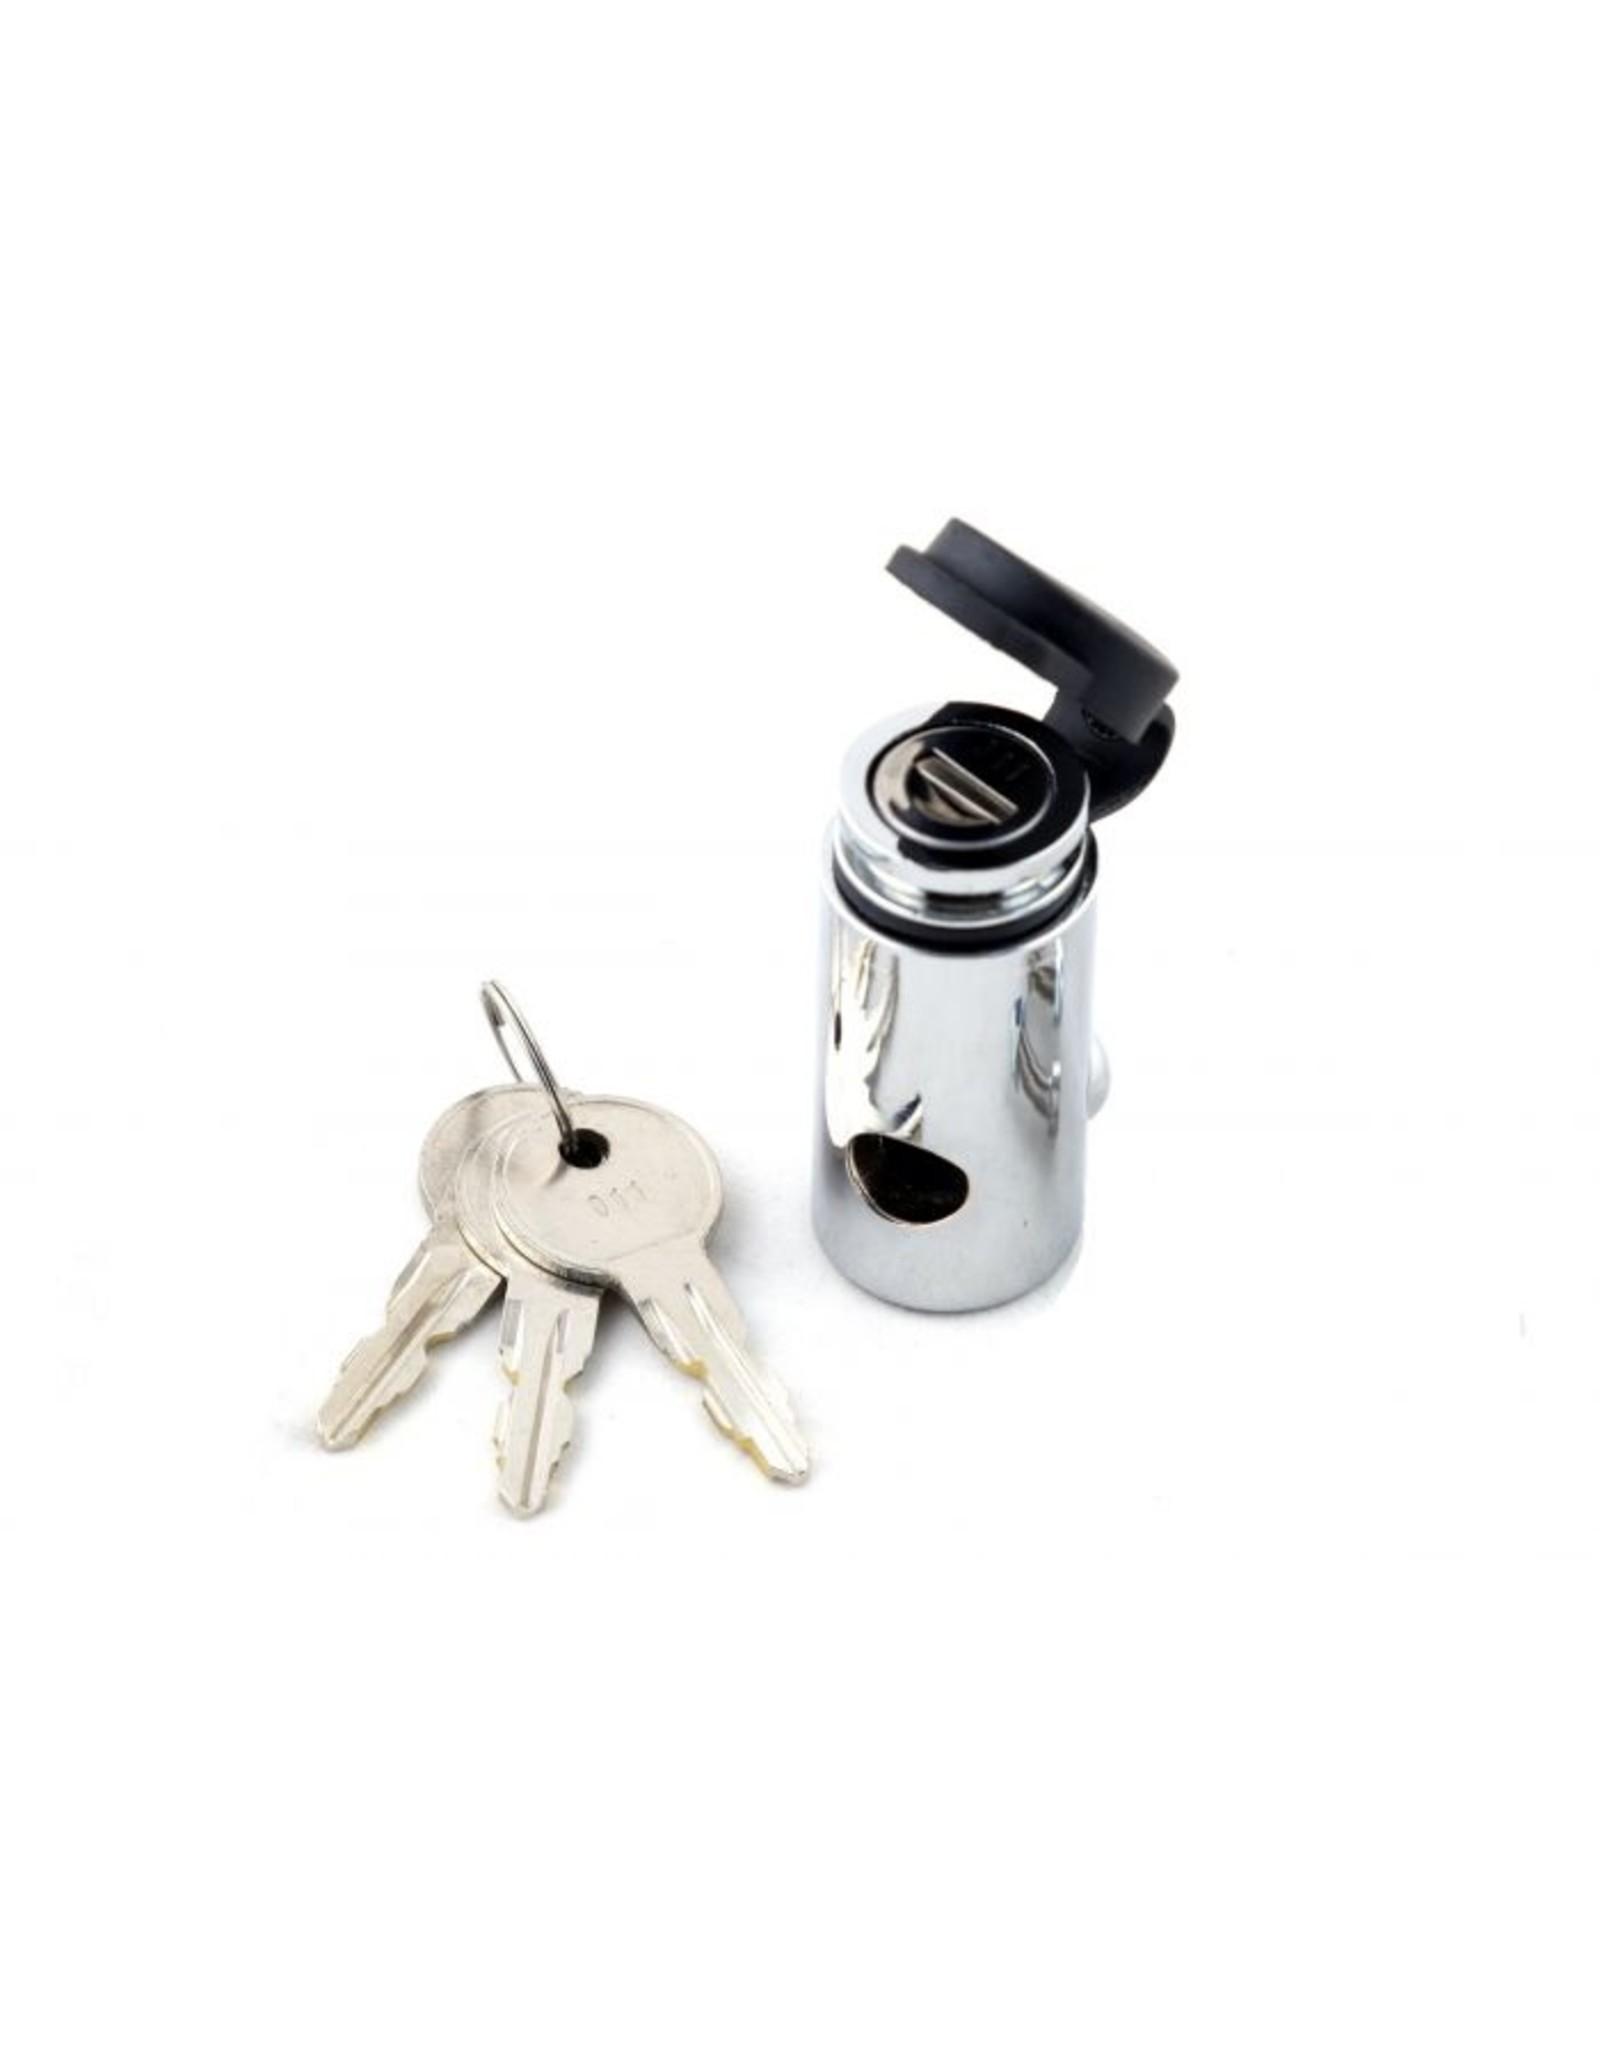 Kuat Kuat Hitch Lock Cylinder w/ Keys and Bottle Opener